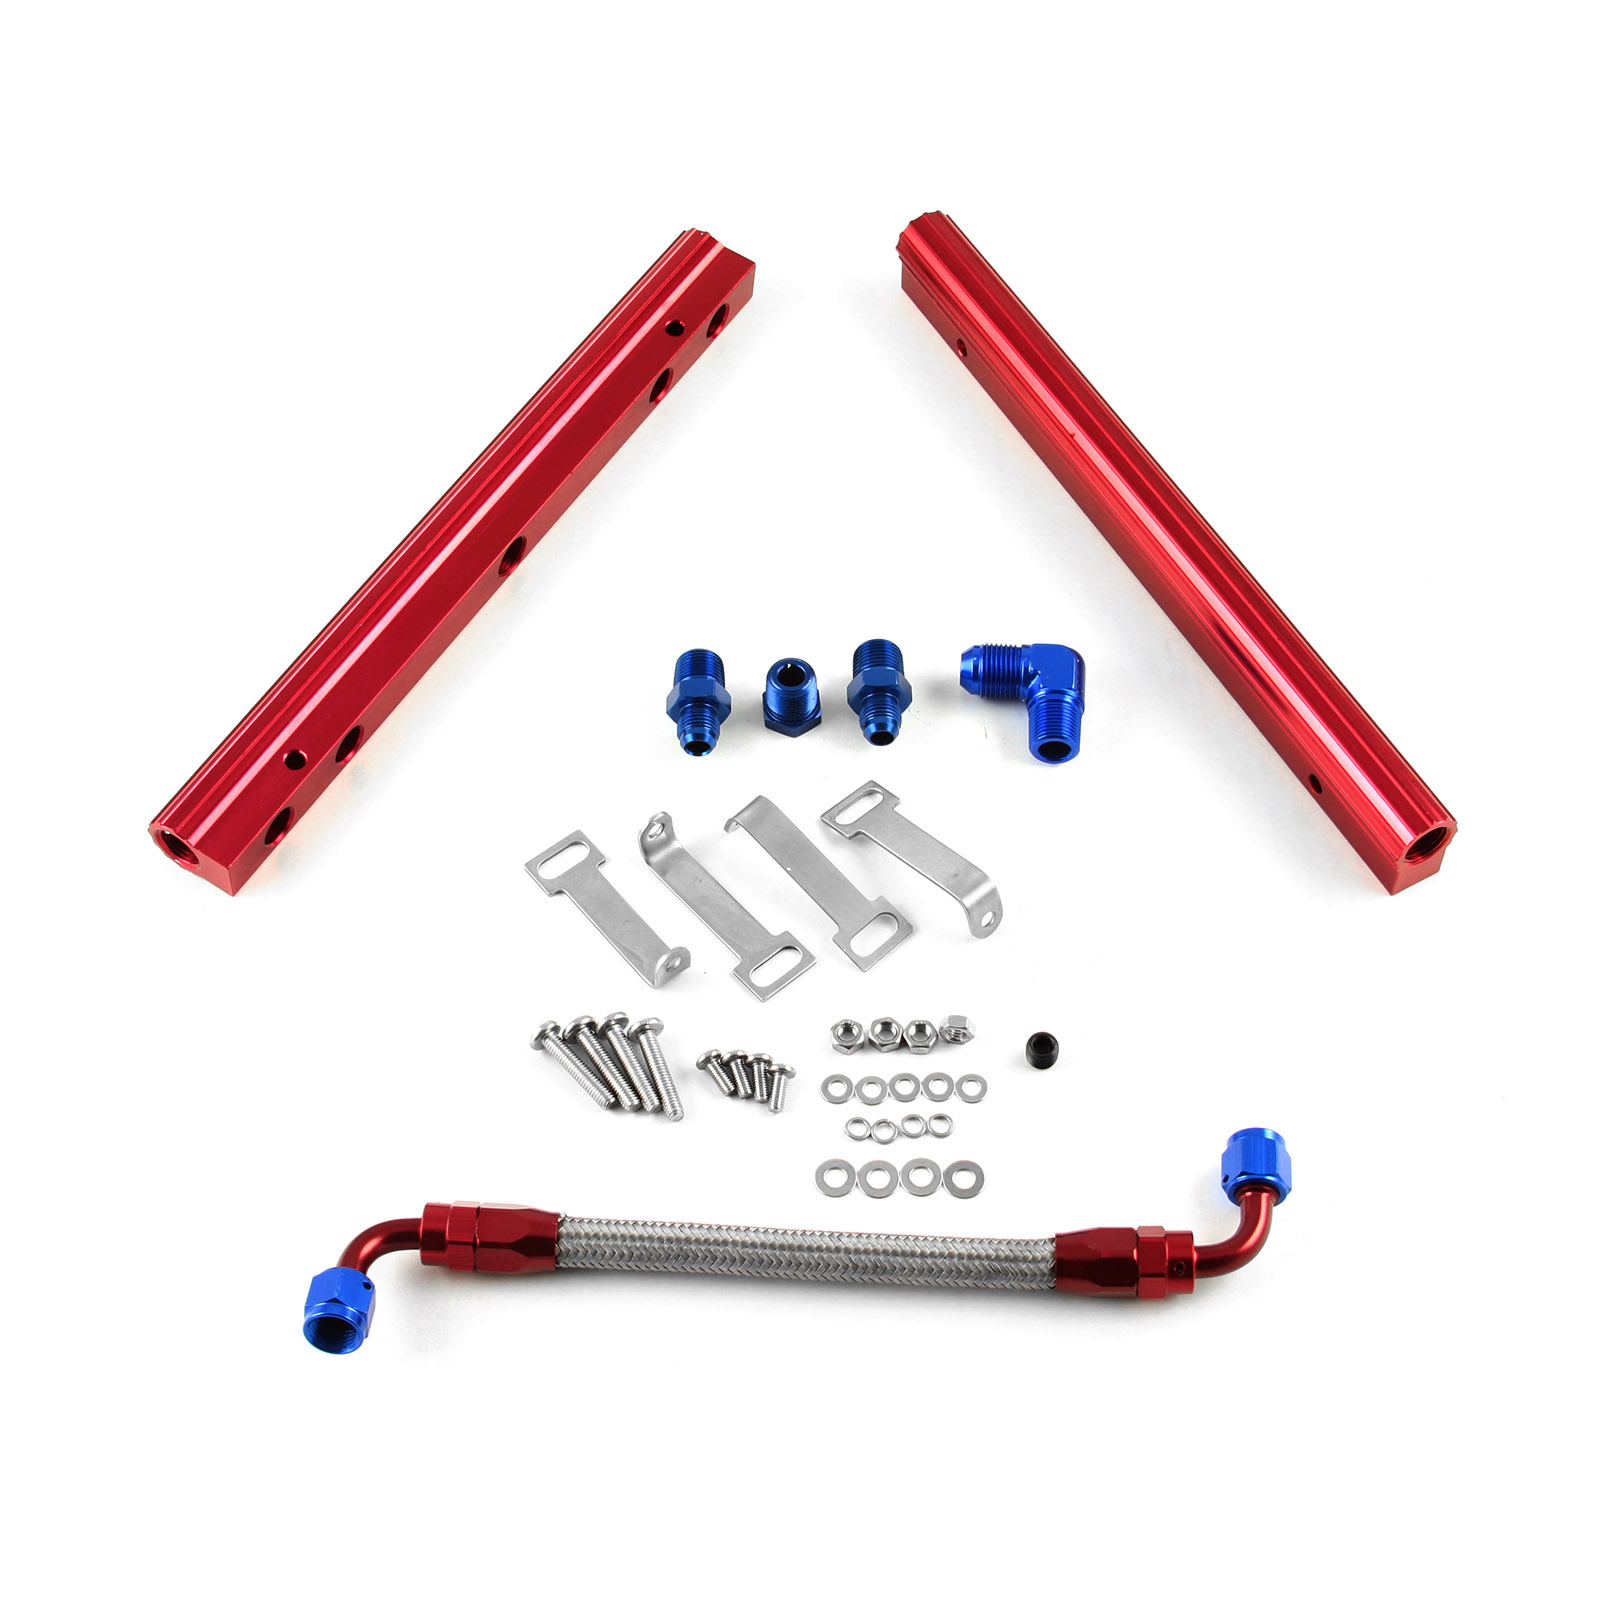 Chevy BBC 454 Billet Aluminum Fuel Injector Rail Kit